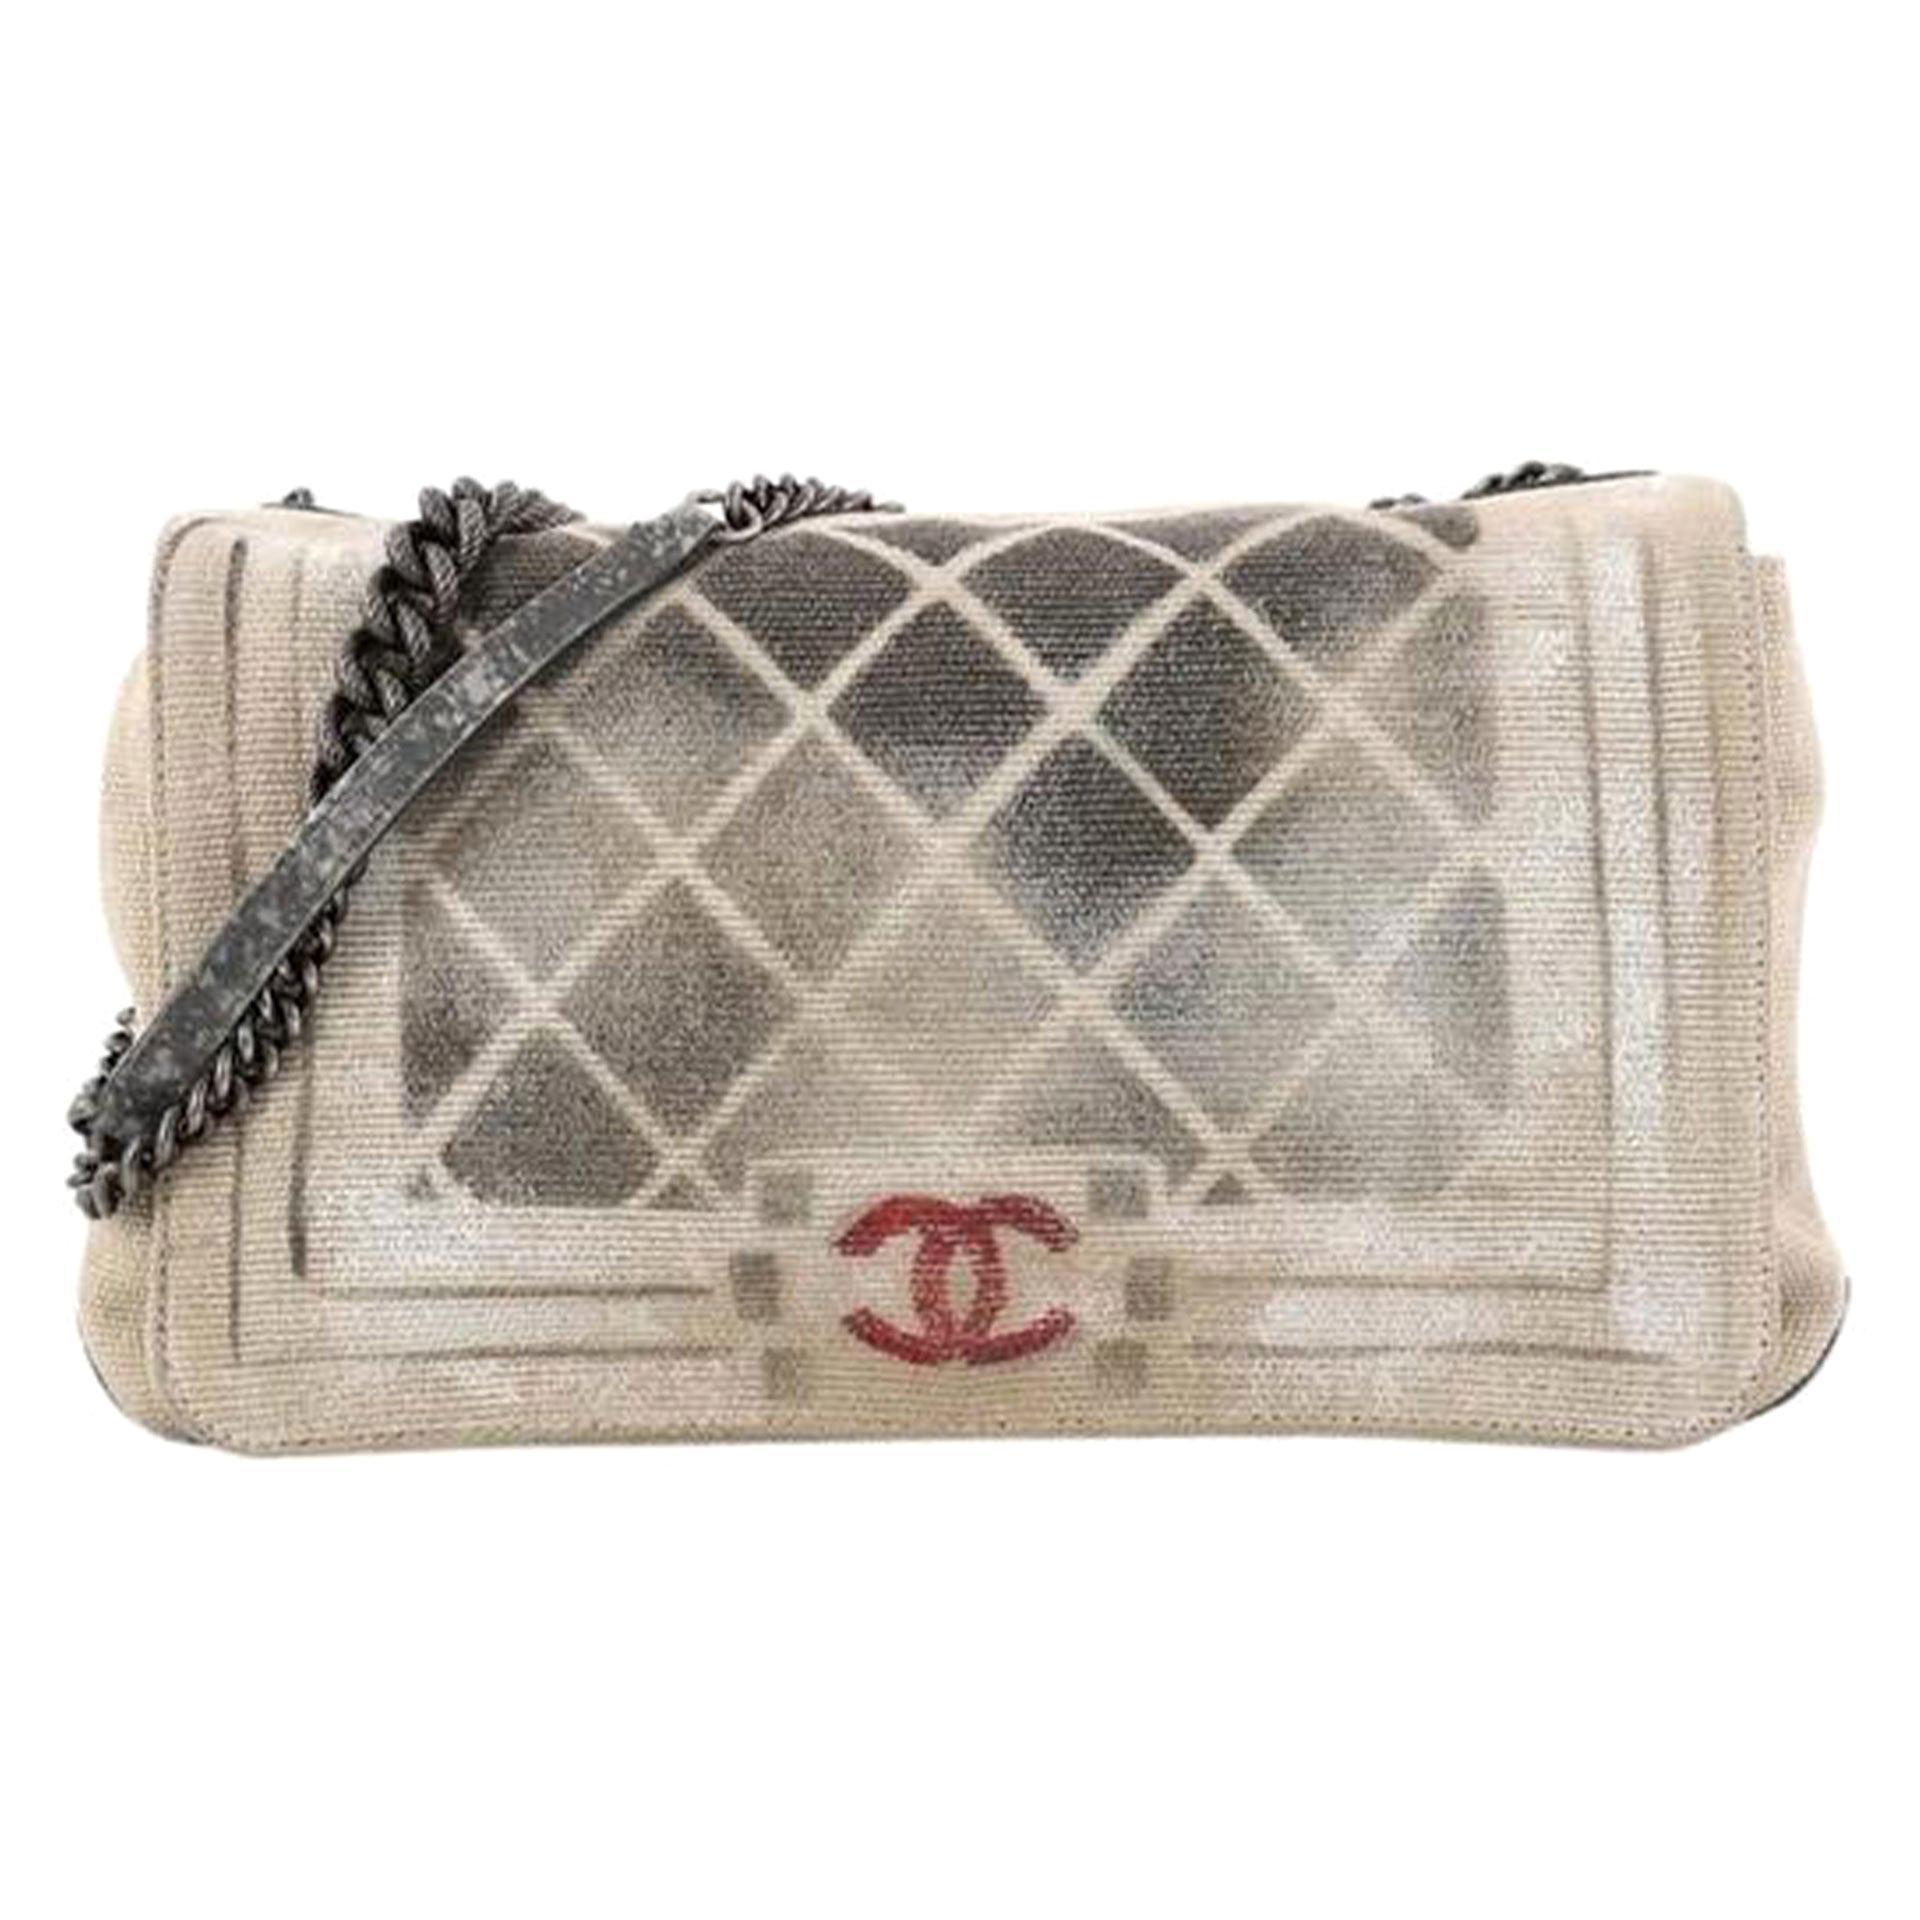 Chanel Classic Flap Graffiti Boy Art School Oh My Khaki Canvas Shoulder Bag